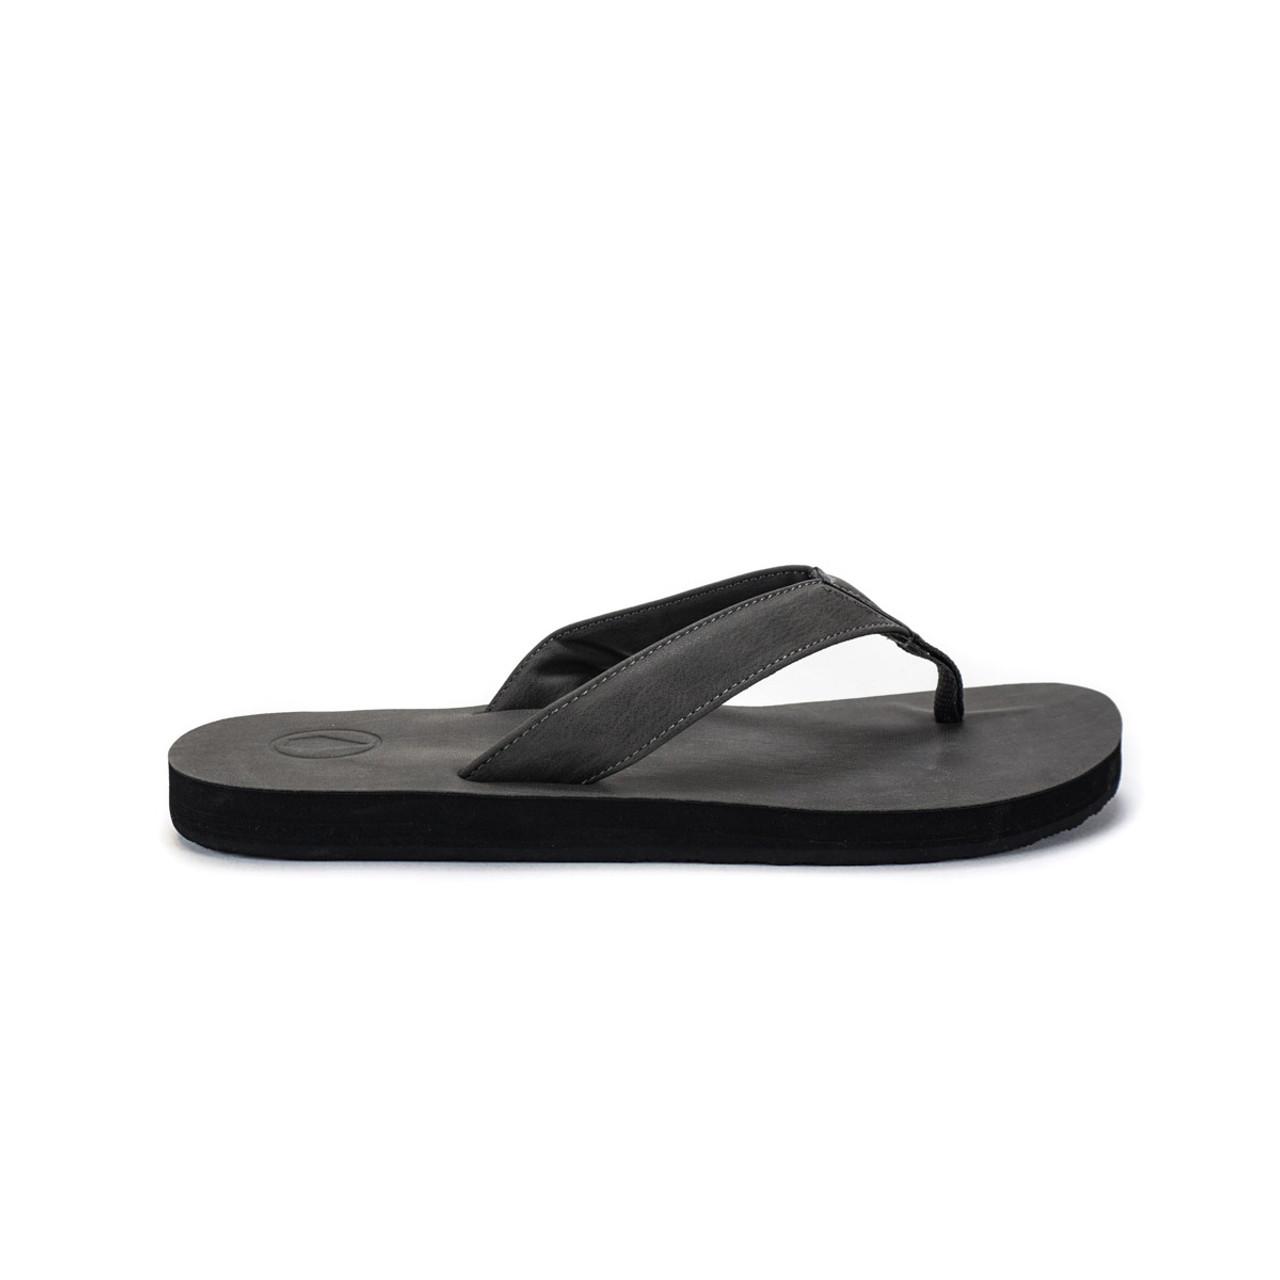 f171b777f2558 Fathom Sandal - Gunmetal Grey - Val Surf